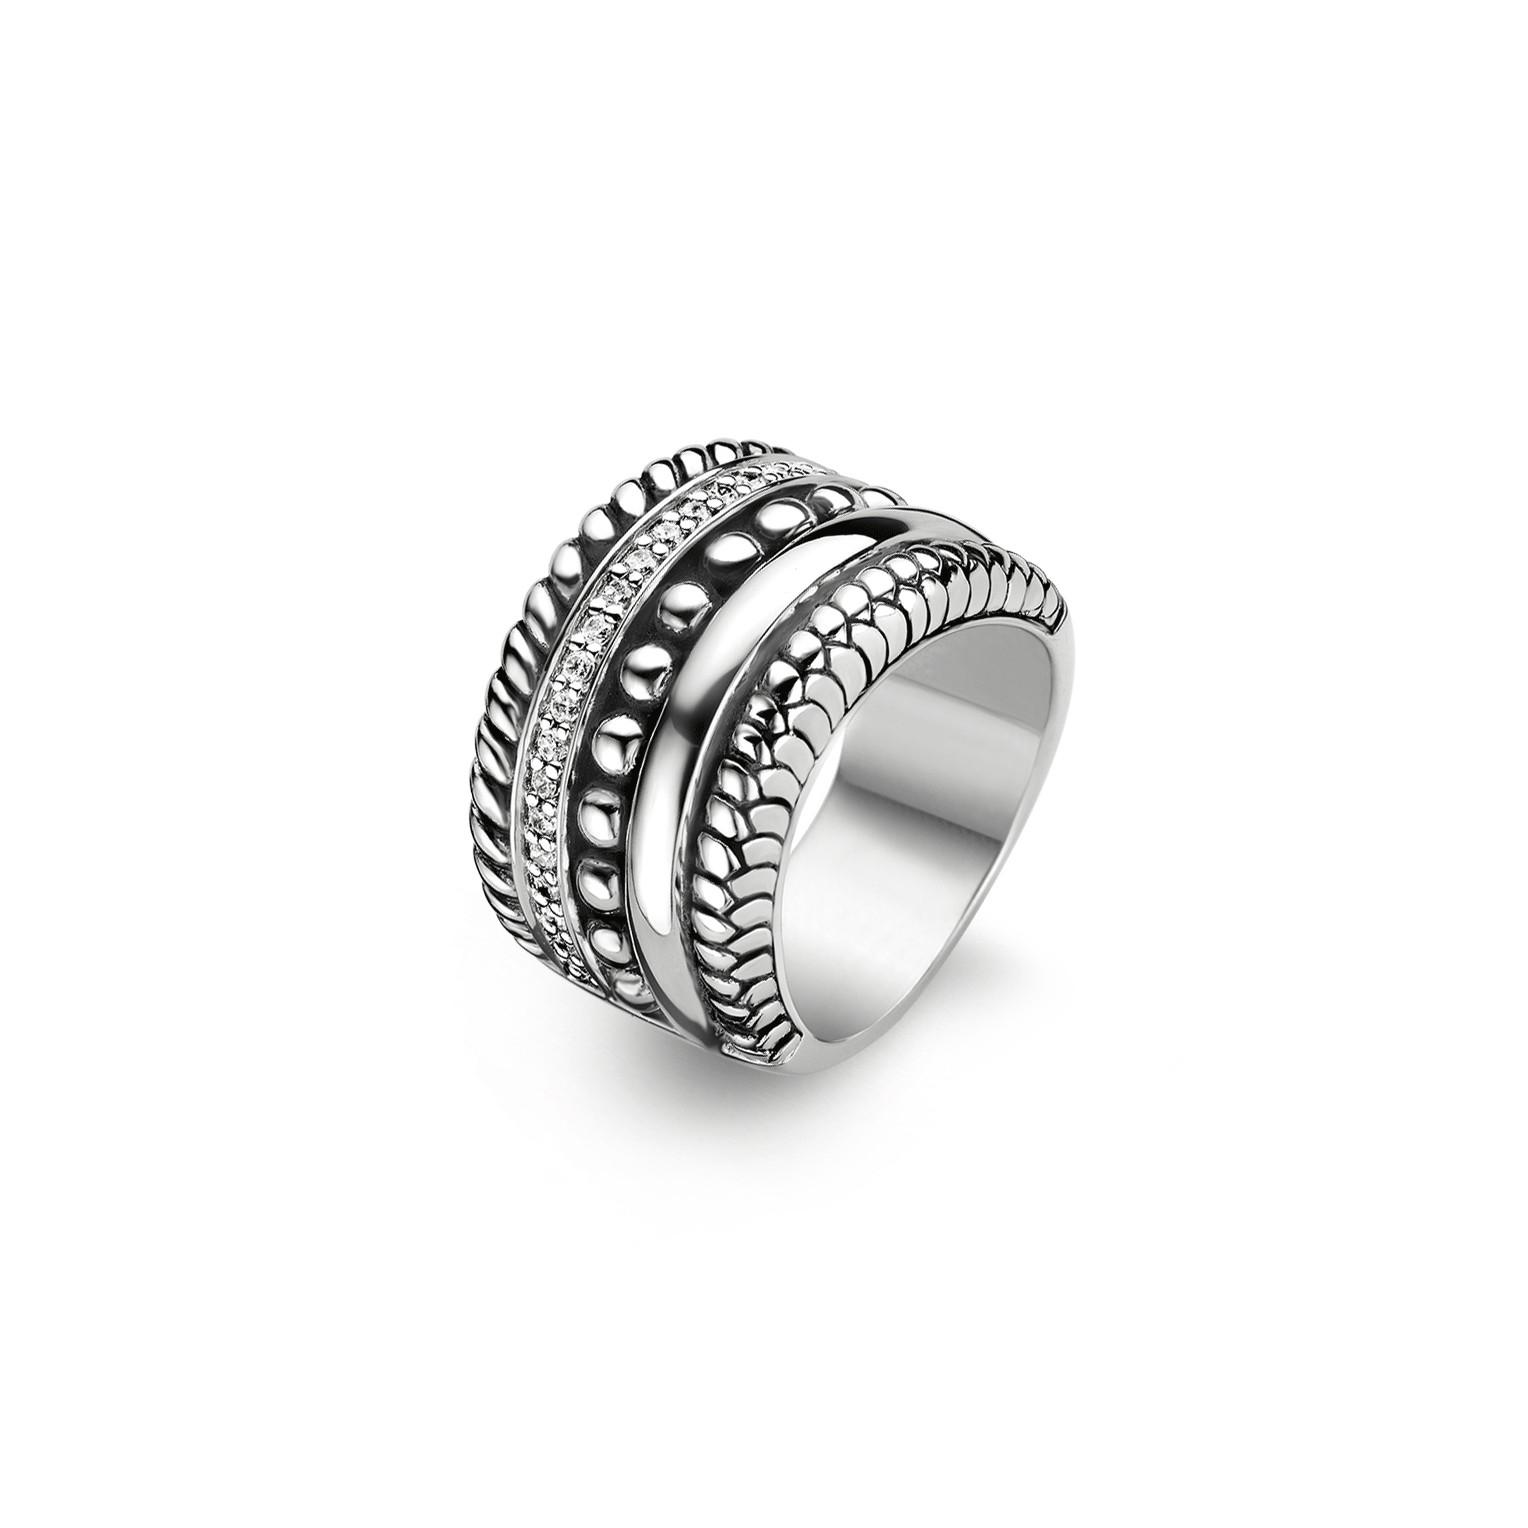 TI SENTO Ring - 1835ZI | Zilver maat 52